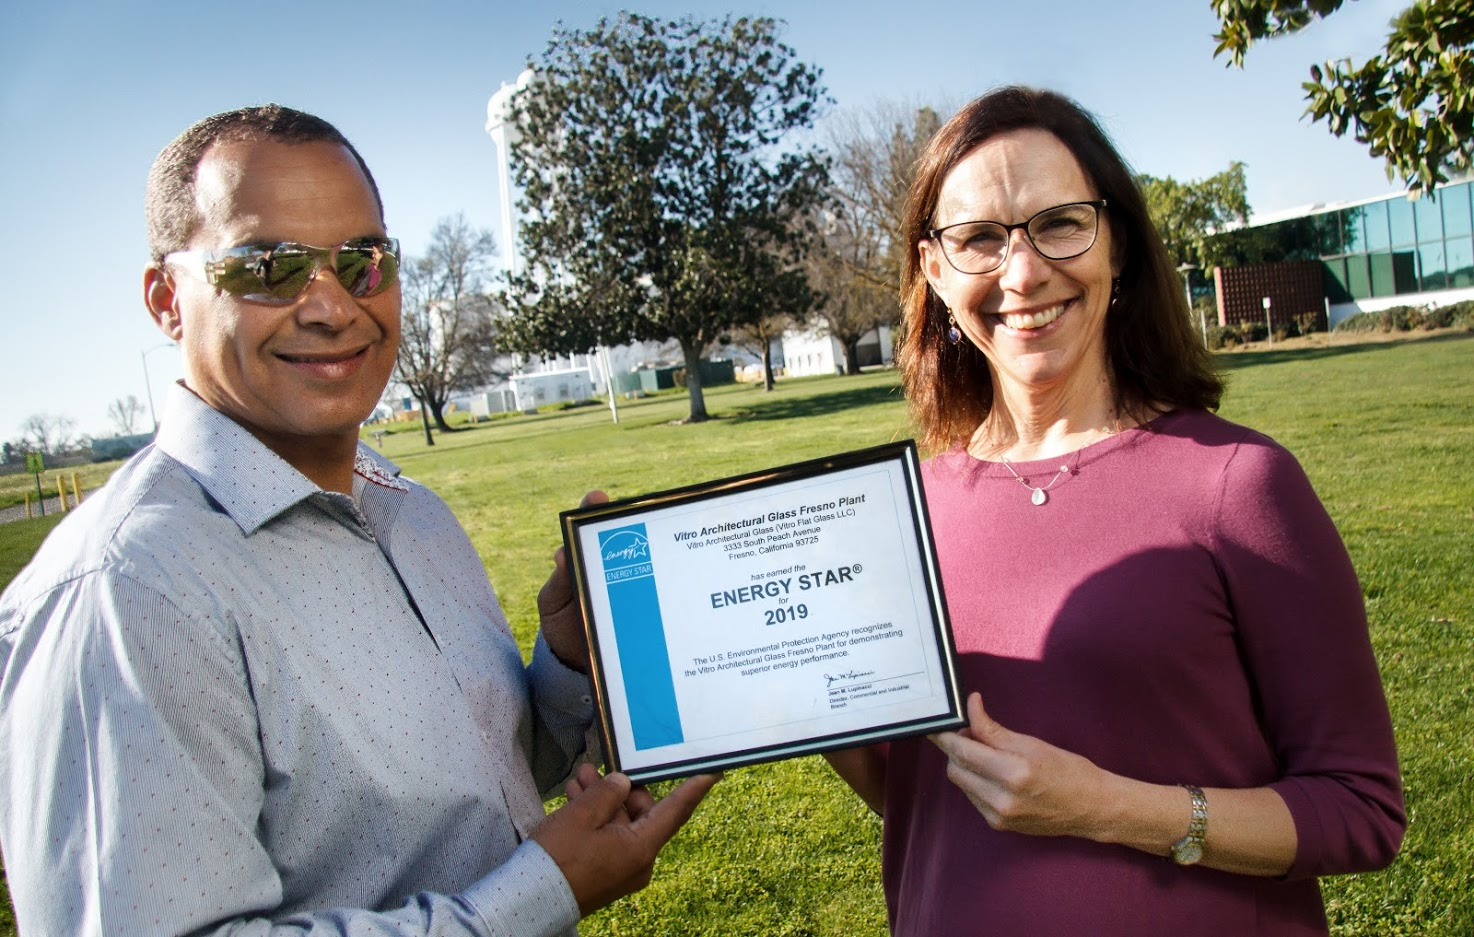 Vitro Glass Fresno, CA staff holding ENERGY STAR certificate